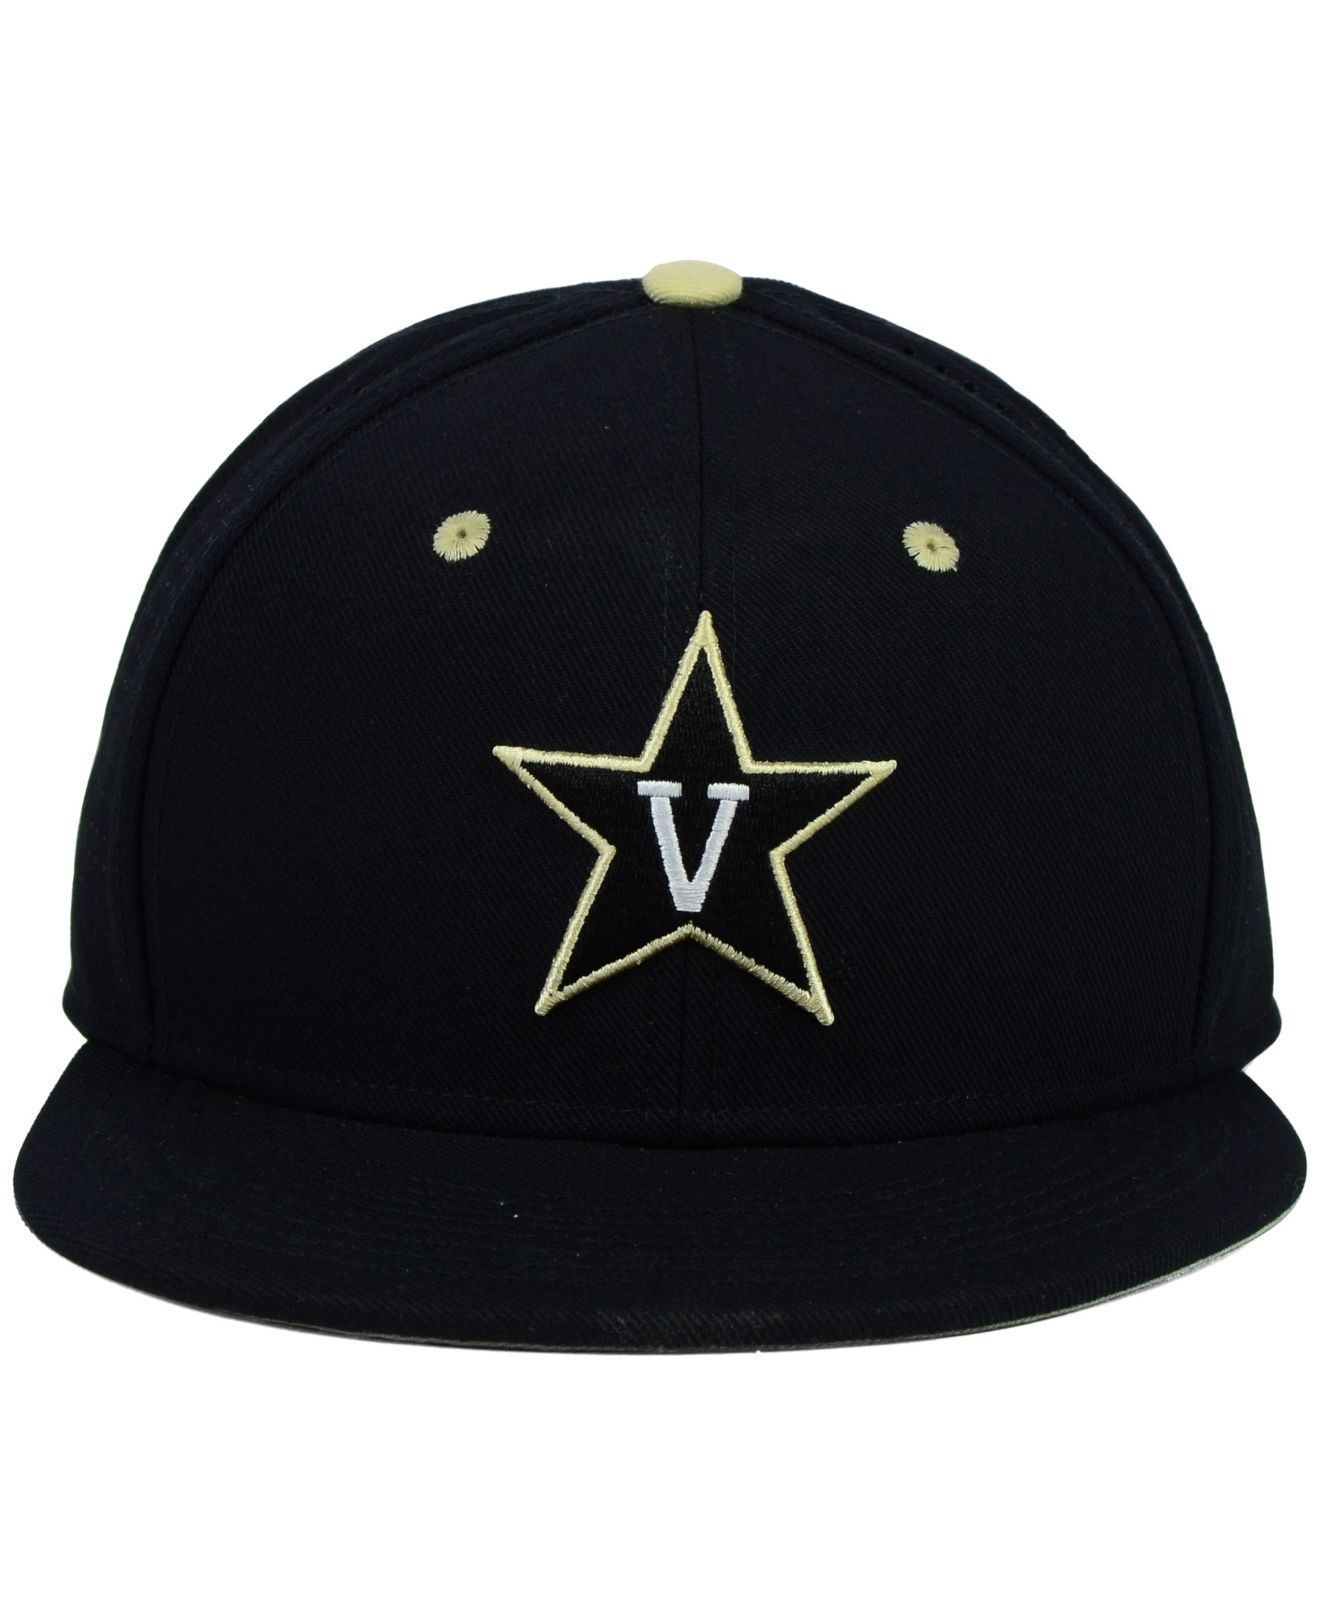 72db27fe3 wholesale vanderbilt baseball hat nike 9d042 69bdf